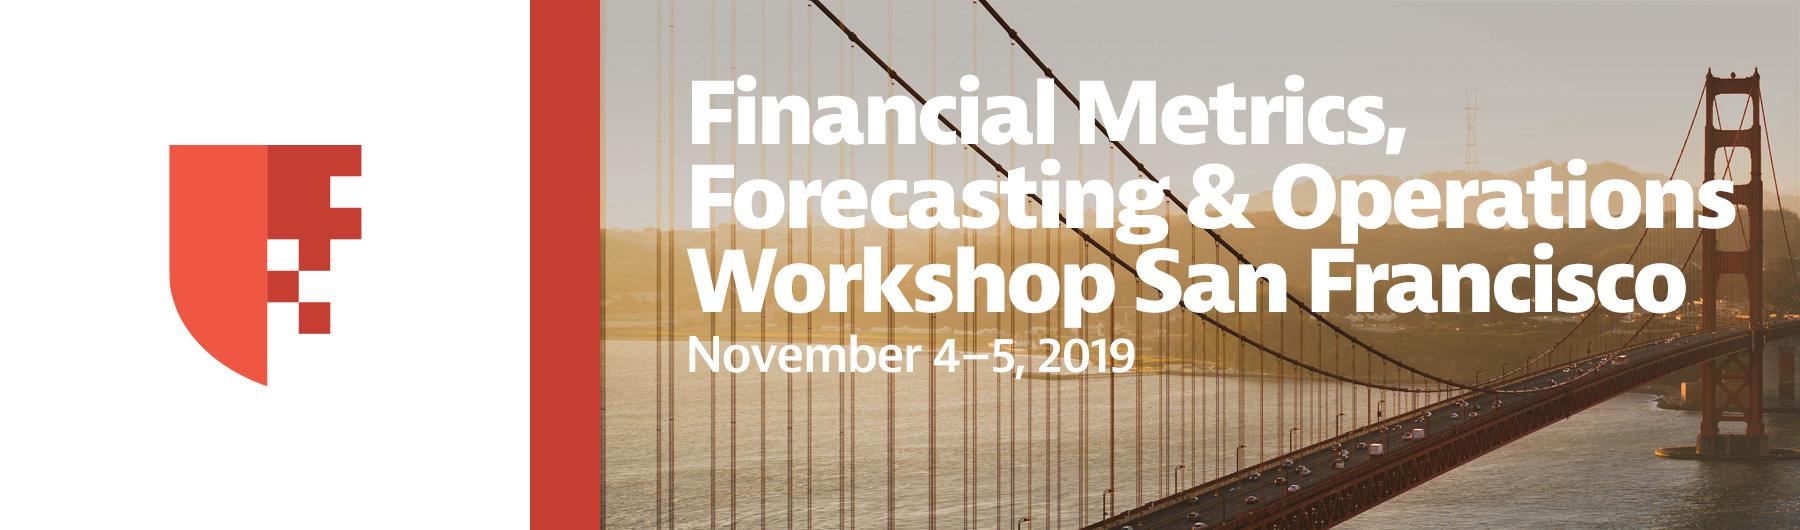 Financial Metrics, Forecasting & Operations Workshop San Francisco